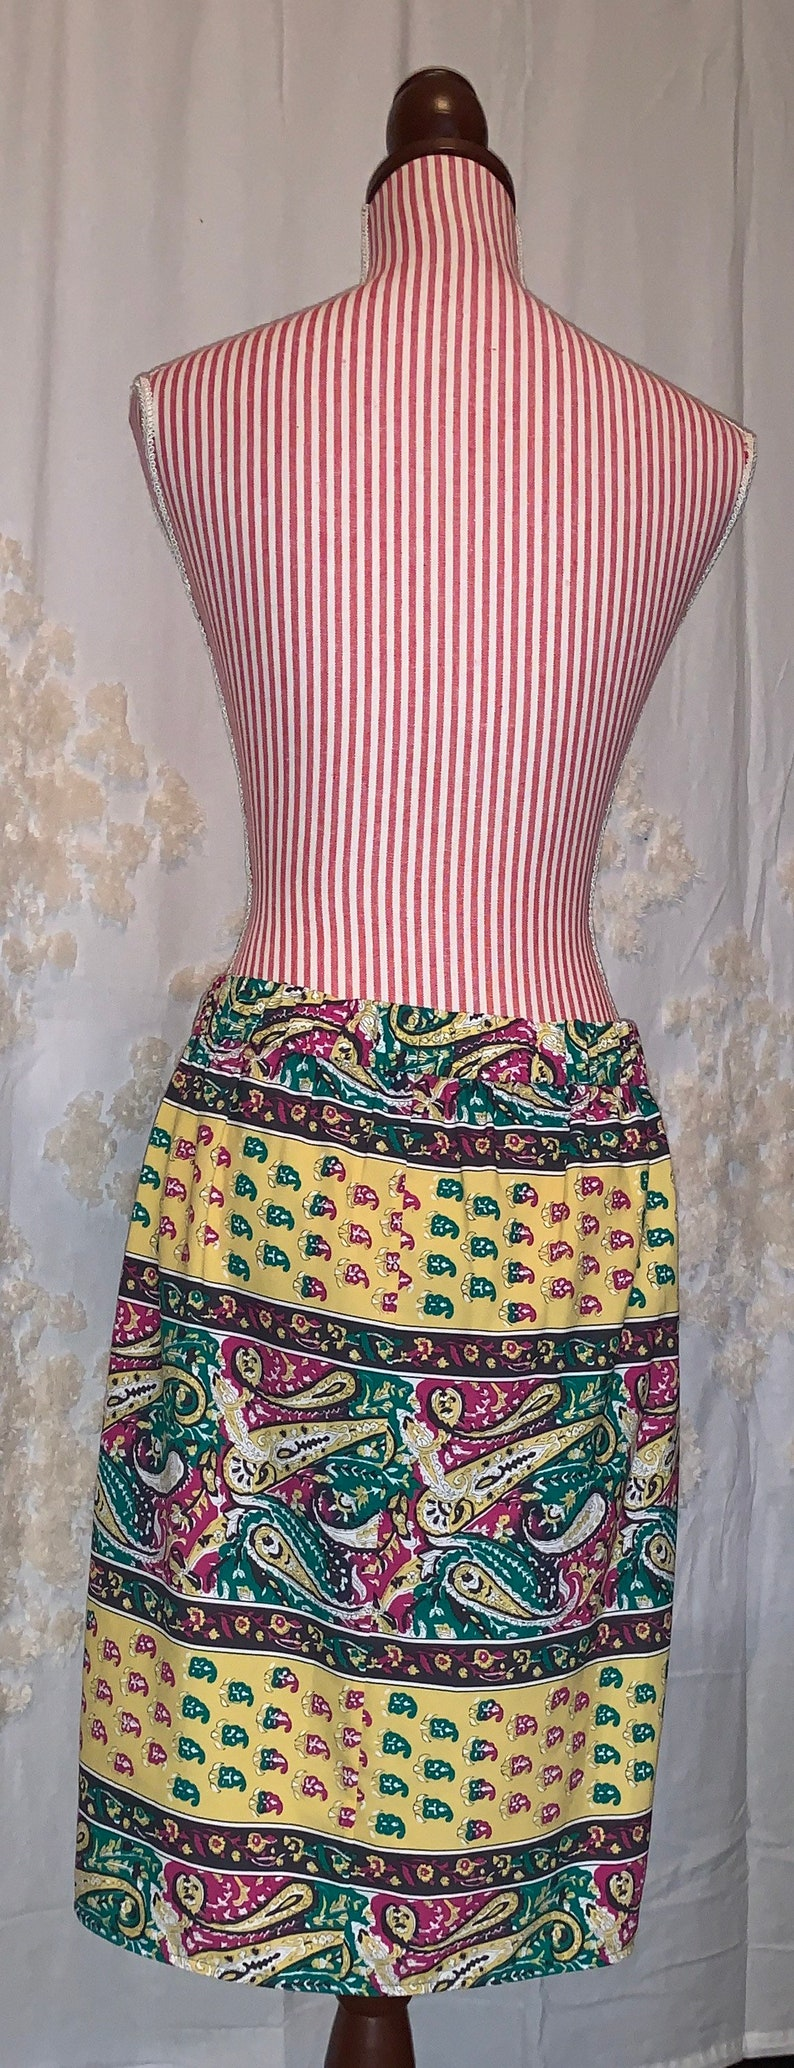 BCBG Max Azria Michaela Paisley Wrap Polyester Skirt Multicolor Medium